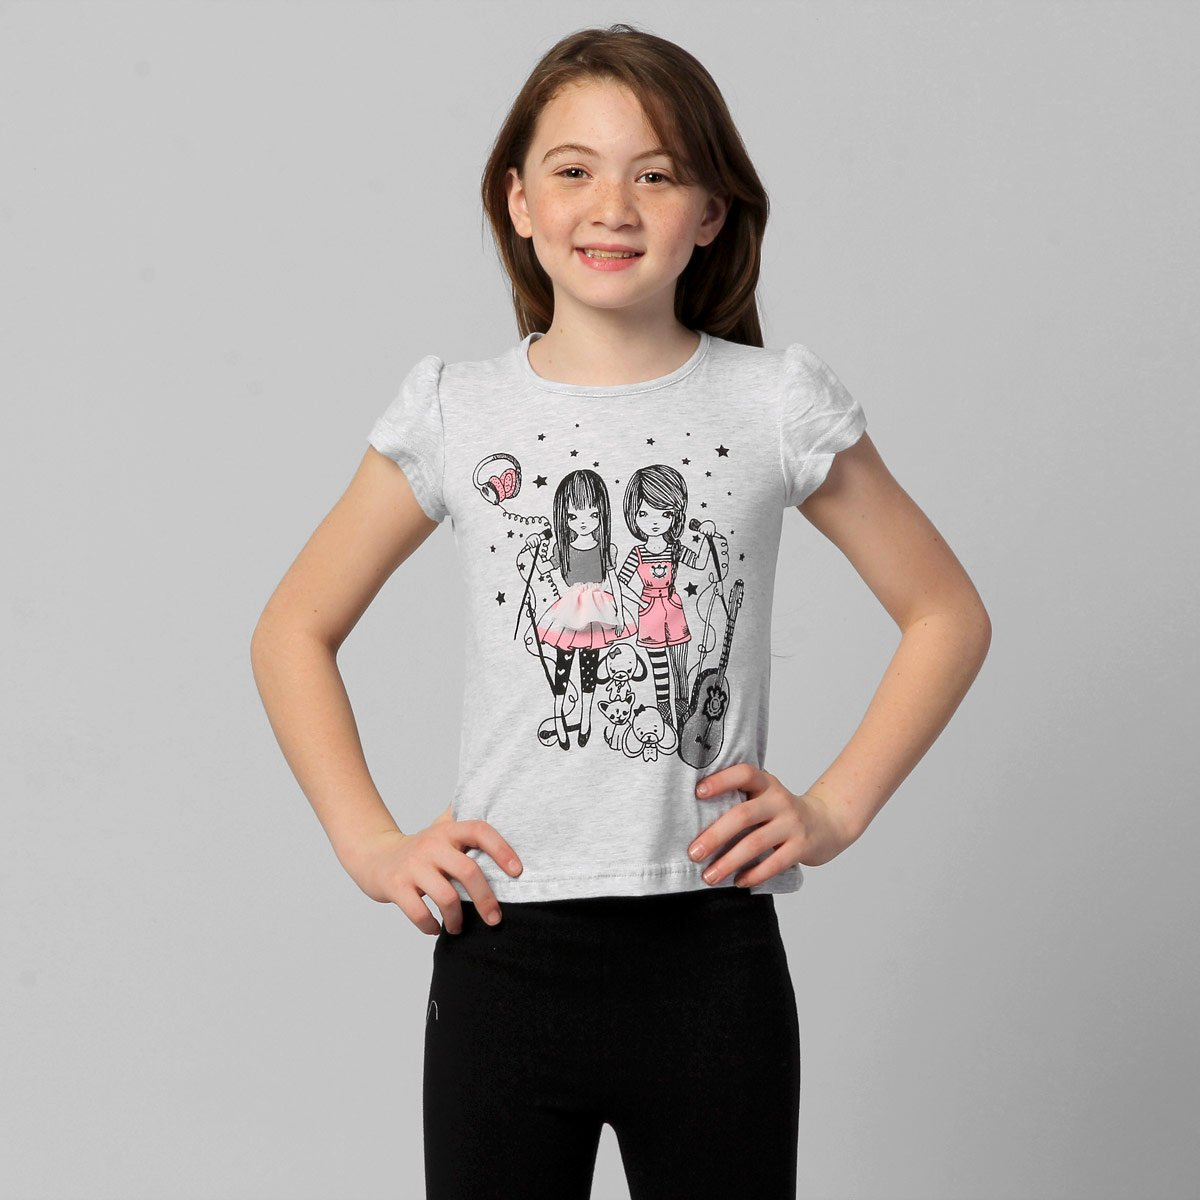 671bcf10b0 Camiseta Corinthians Meninas Corinthianismo Infantil - Compre Agora ...